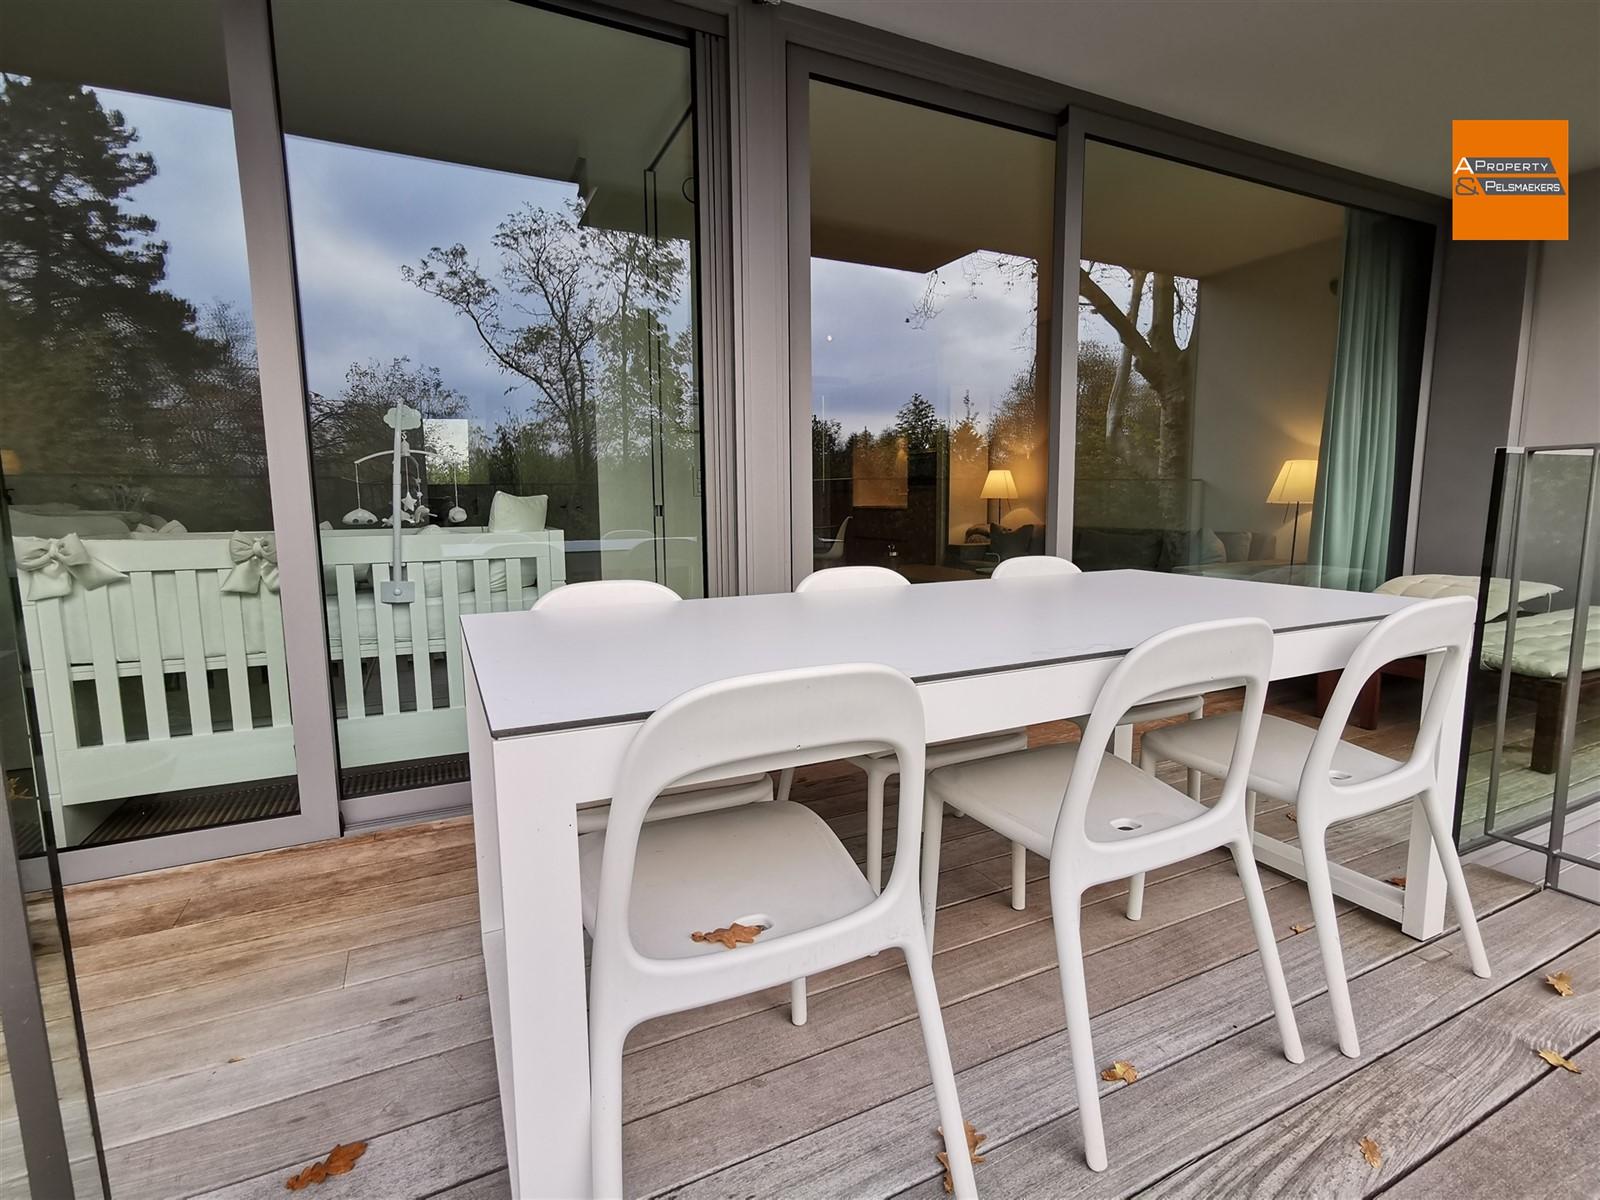 Foto 13 : Gemeubeld appartement in 1050 ELSENE (België) - Prijs € 1.500